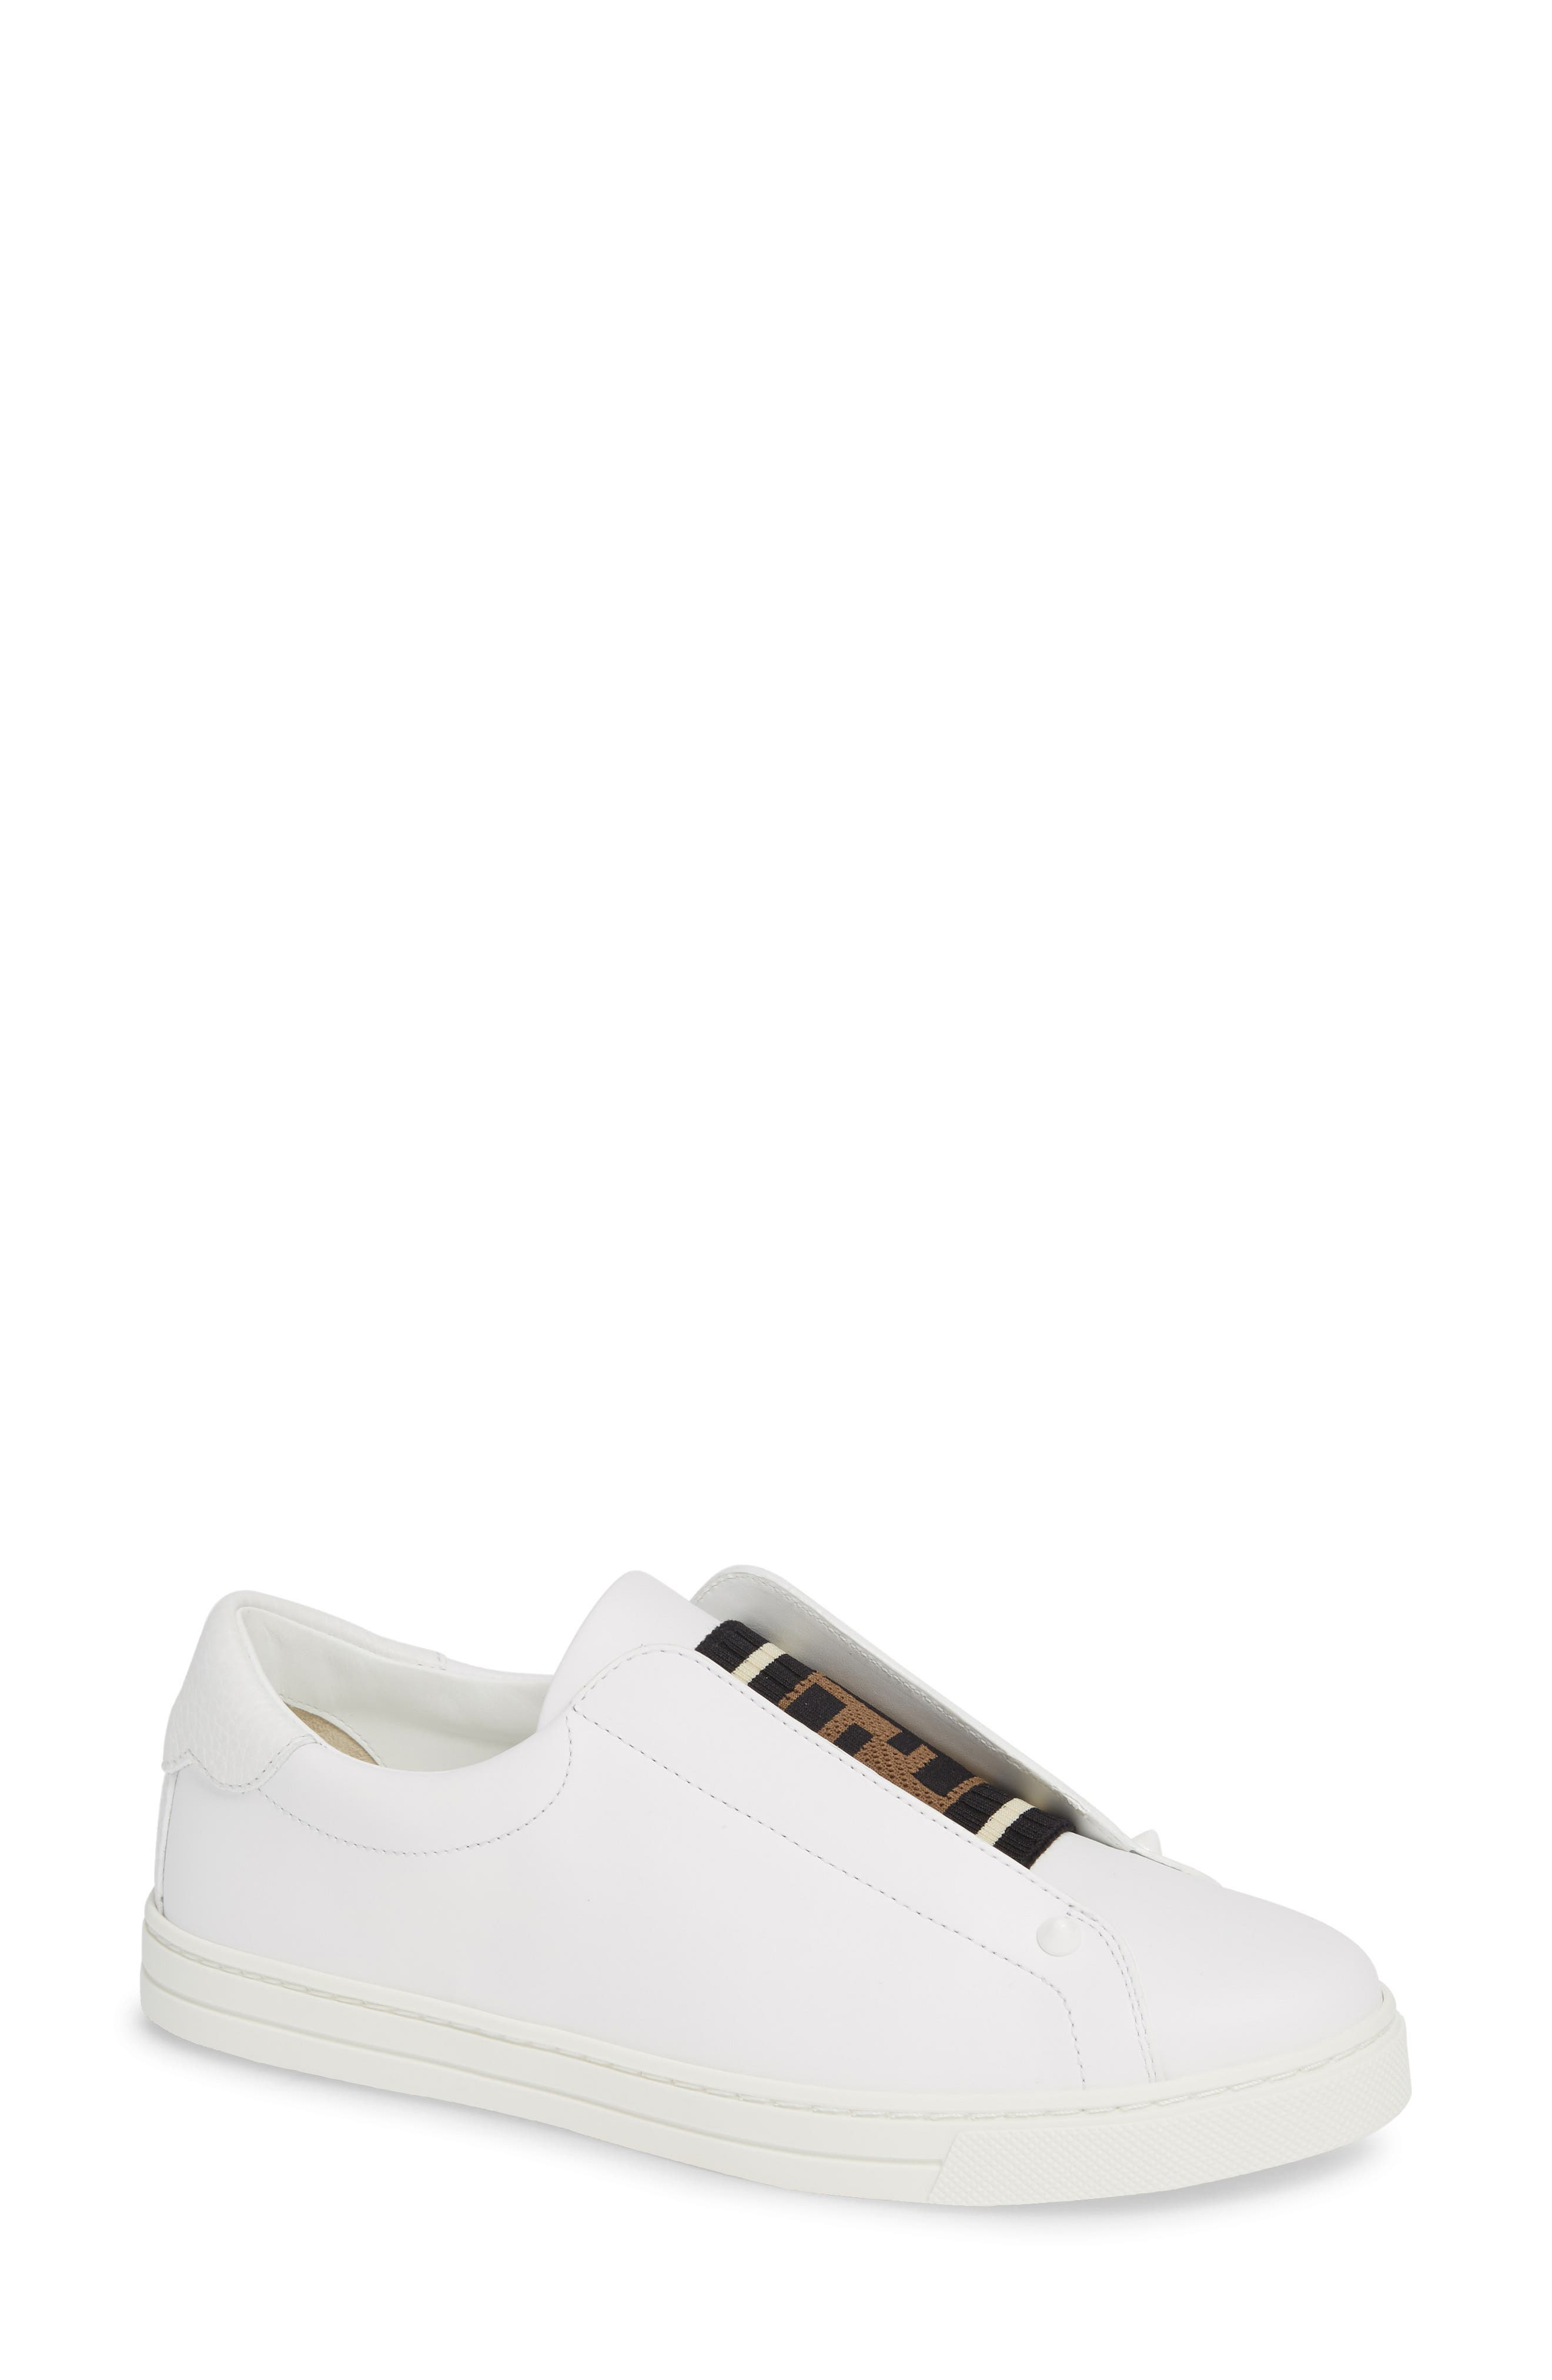 Fendi Rockoclick Knit Logo Slip-On Sneaker, White